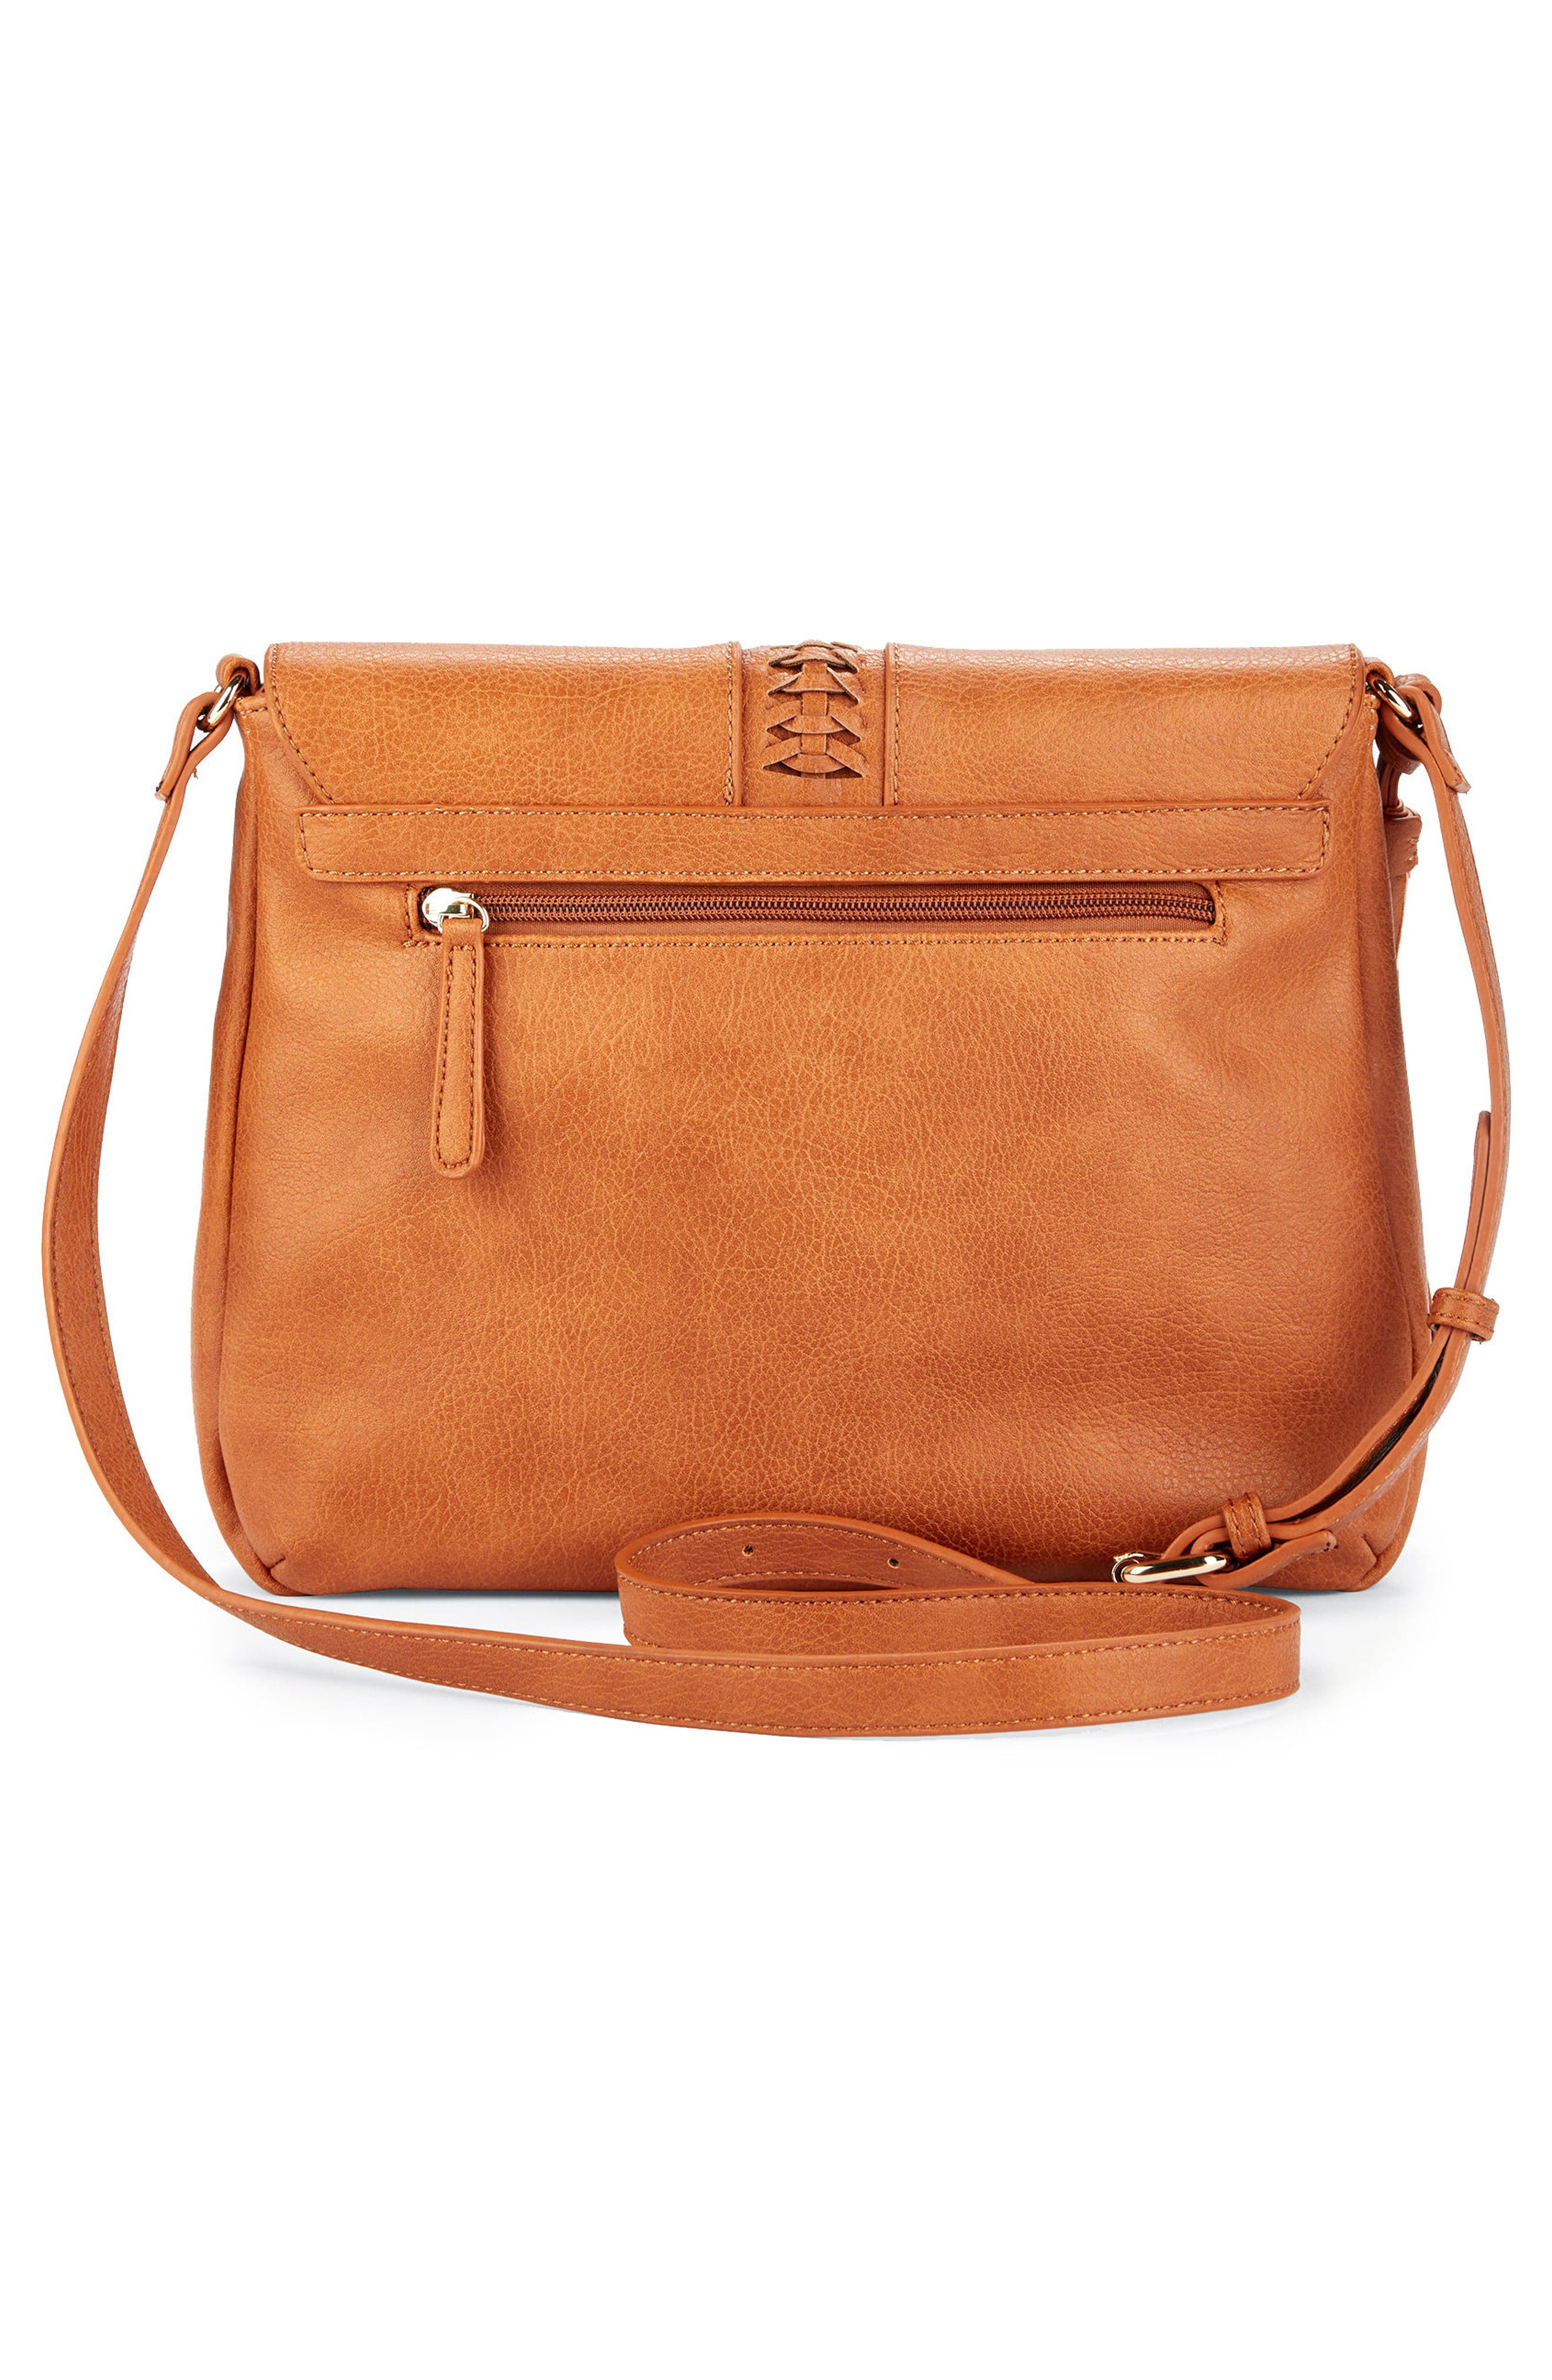 Tara Stitch Detail Faux Leather Crossbody Bag,                             Alternate thumbnail 2, color,                             Cognac